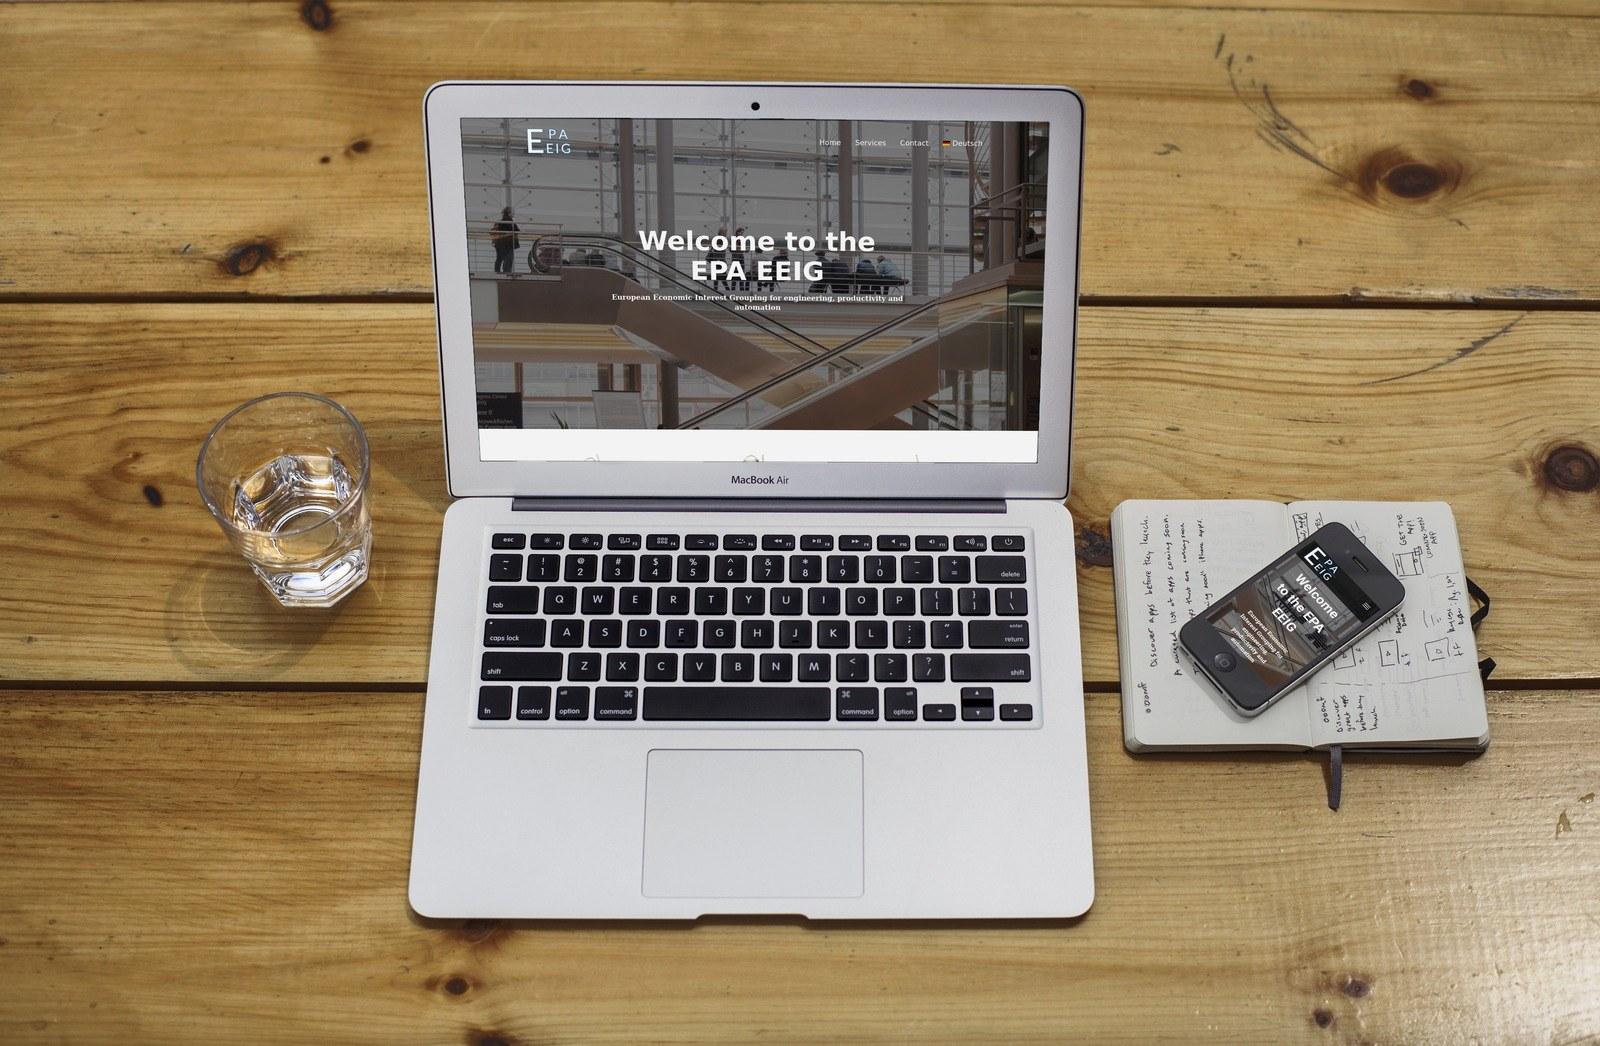 EWIV Desktop